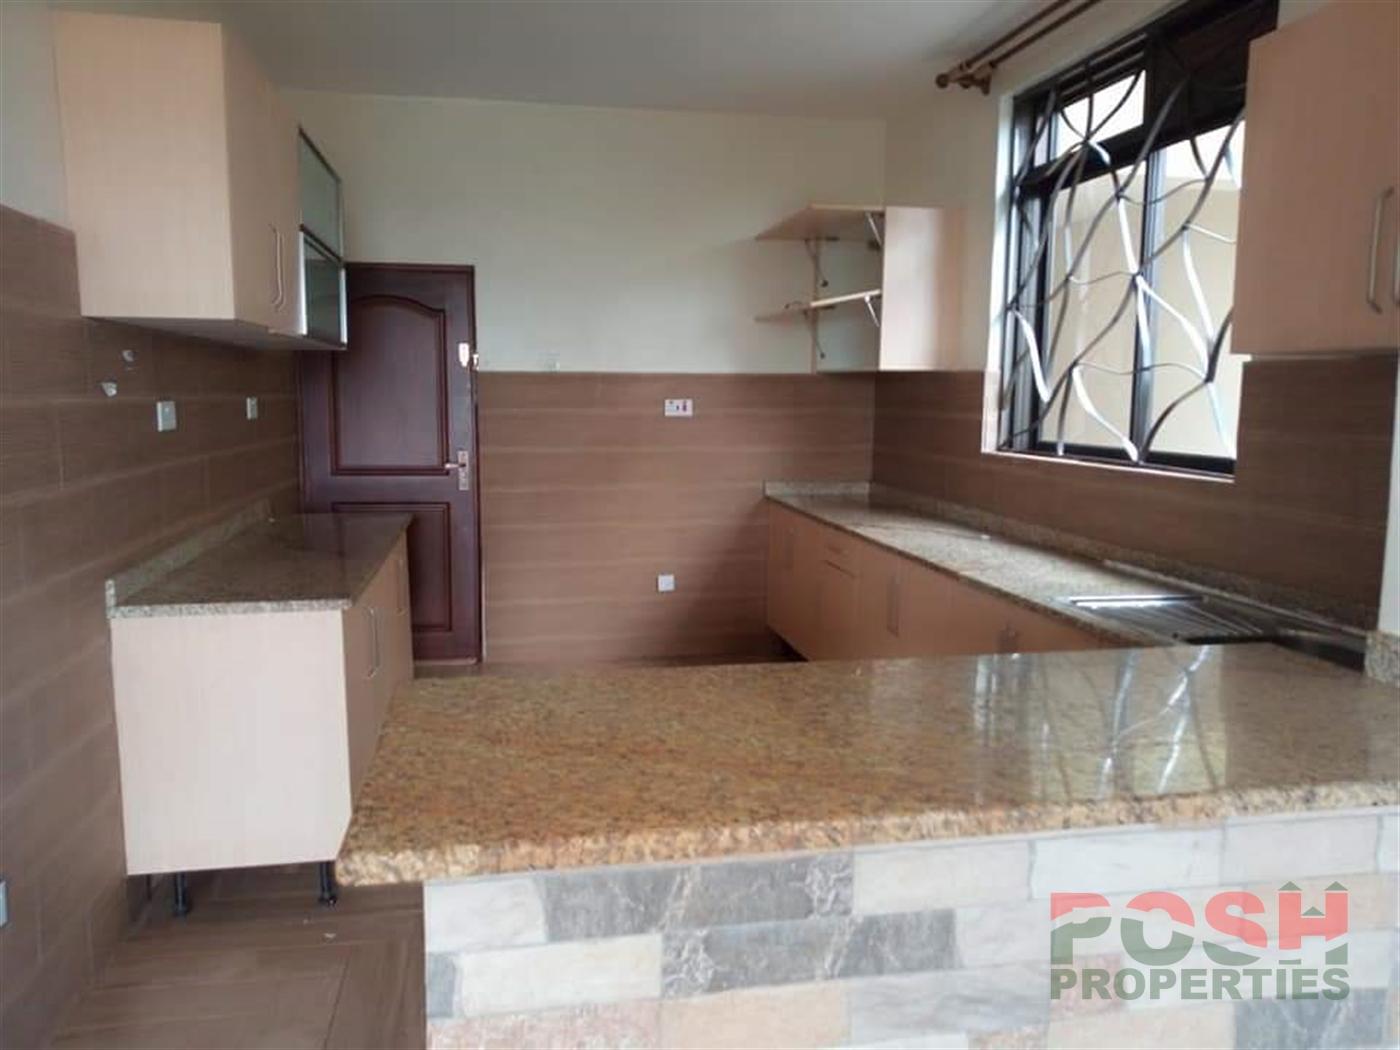 Town House for rent in Butabika Kampala